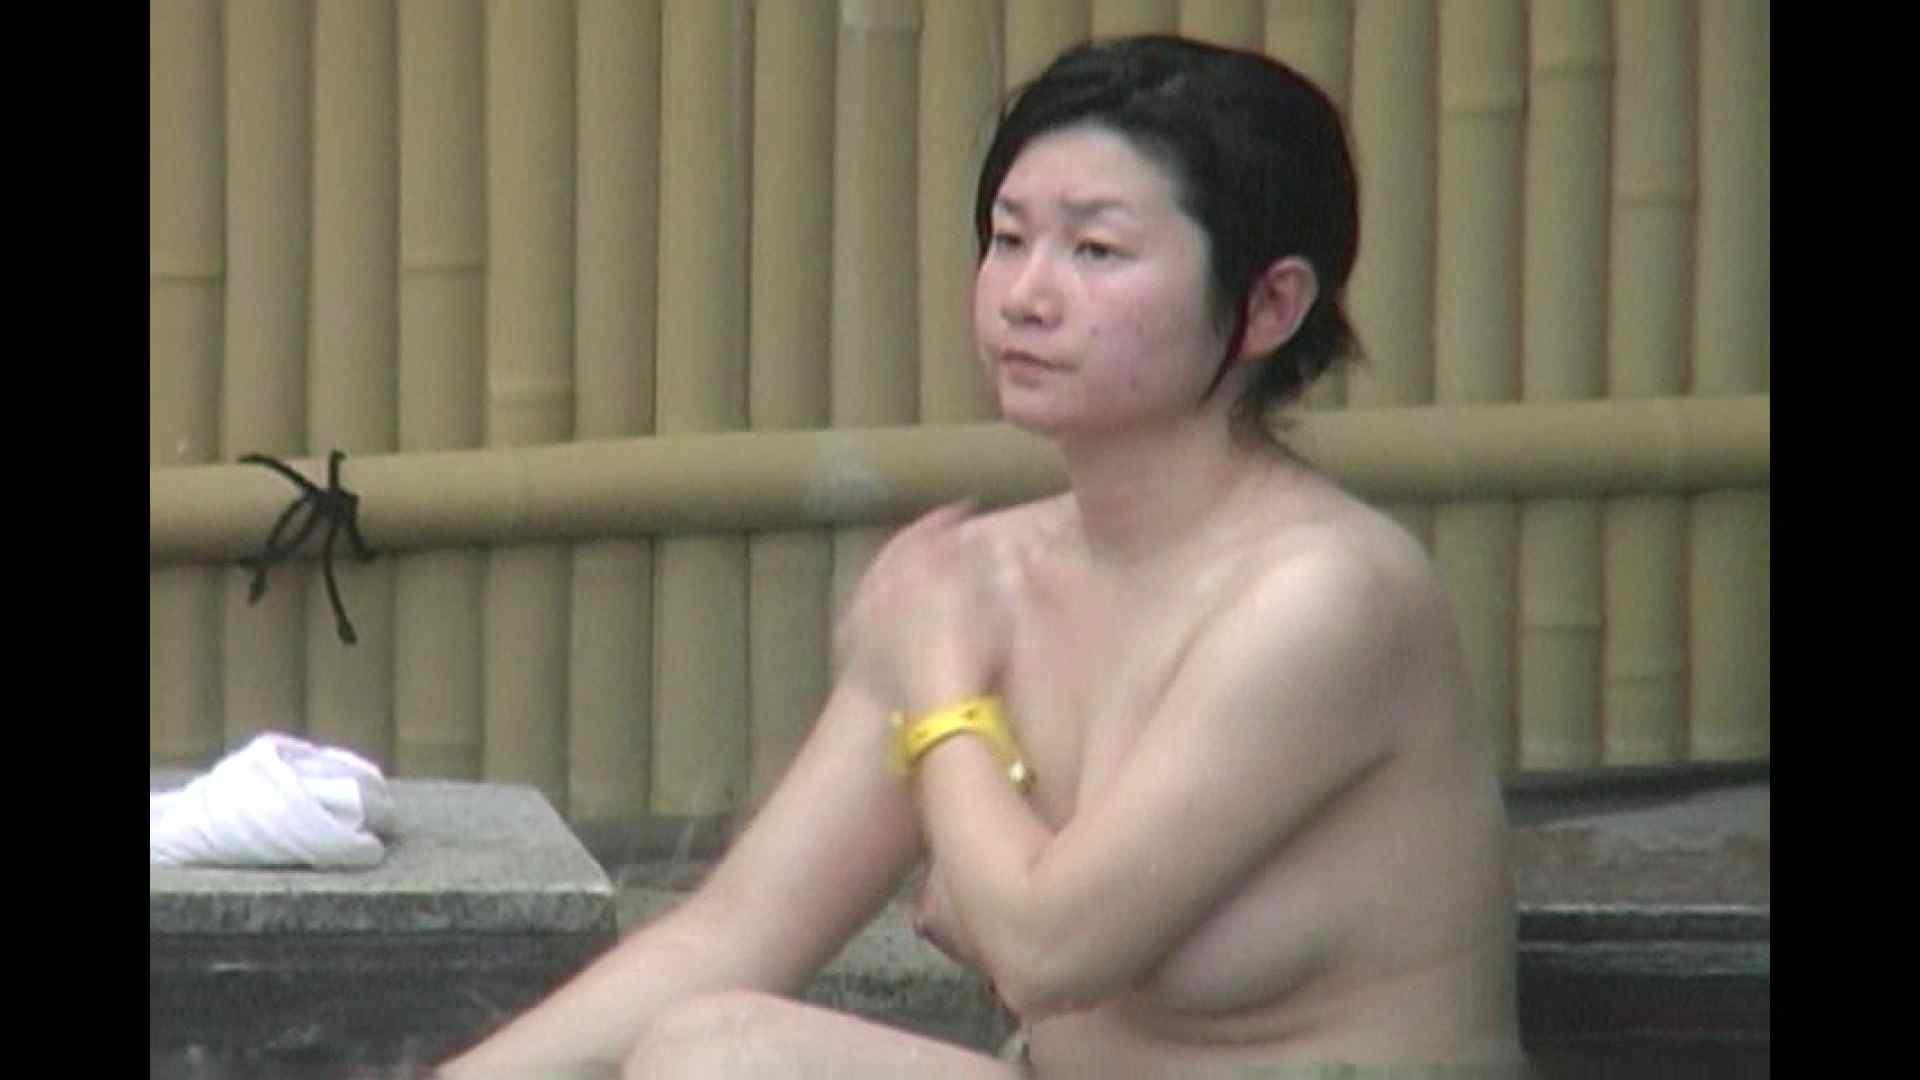 Aquaな露天風呂Vol.545 盗撮 | OLセックス  56画像 13